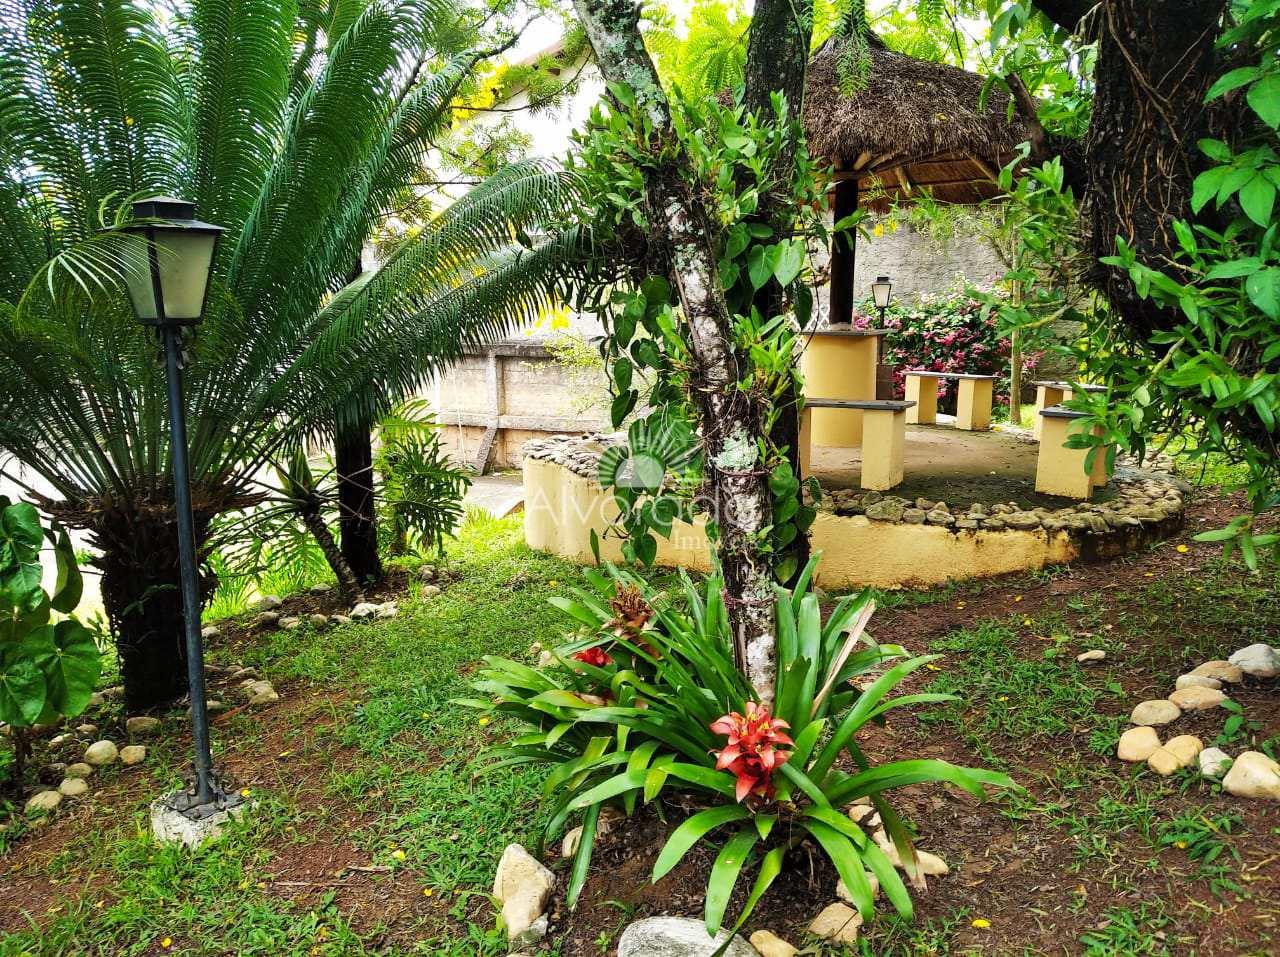 Chácara com 2 dorms, Jardim Leonor, Itatiba - R$ 430 mil, Cod: CH021